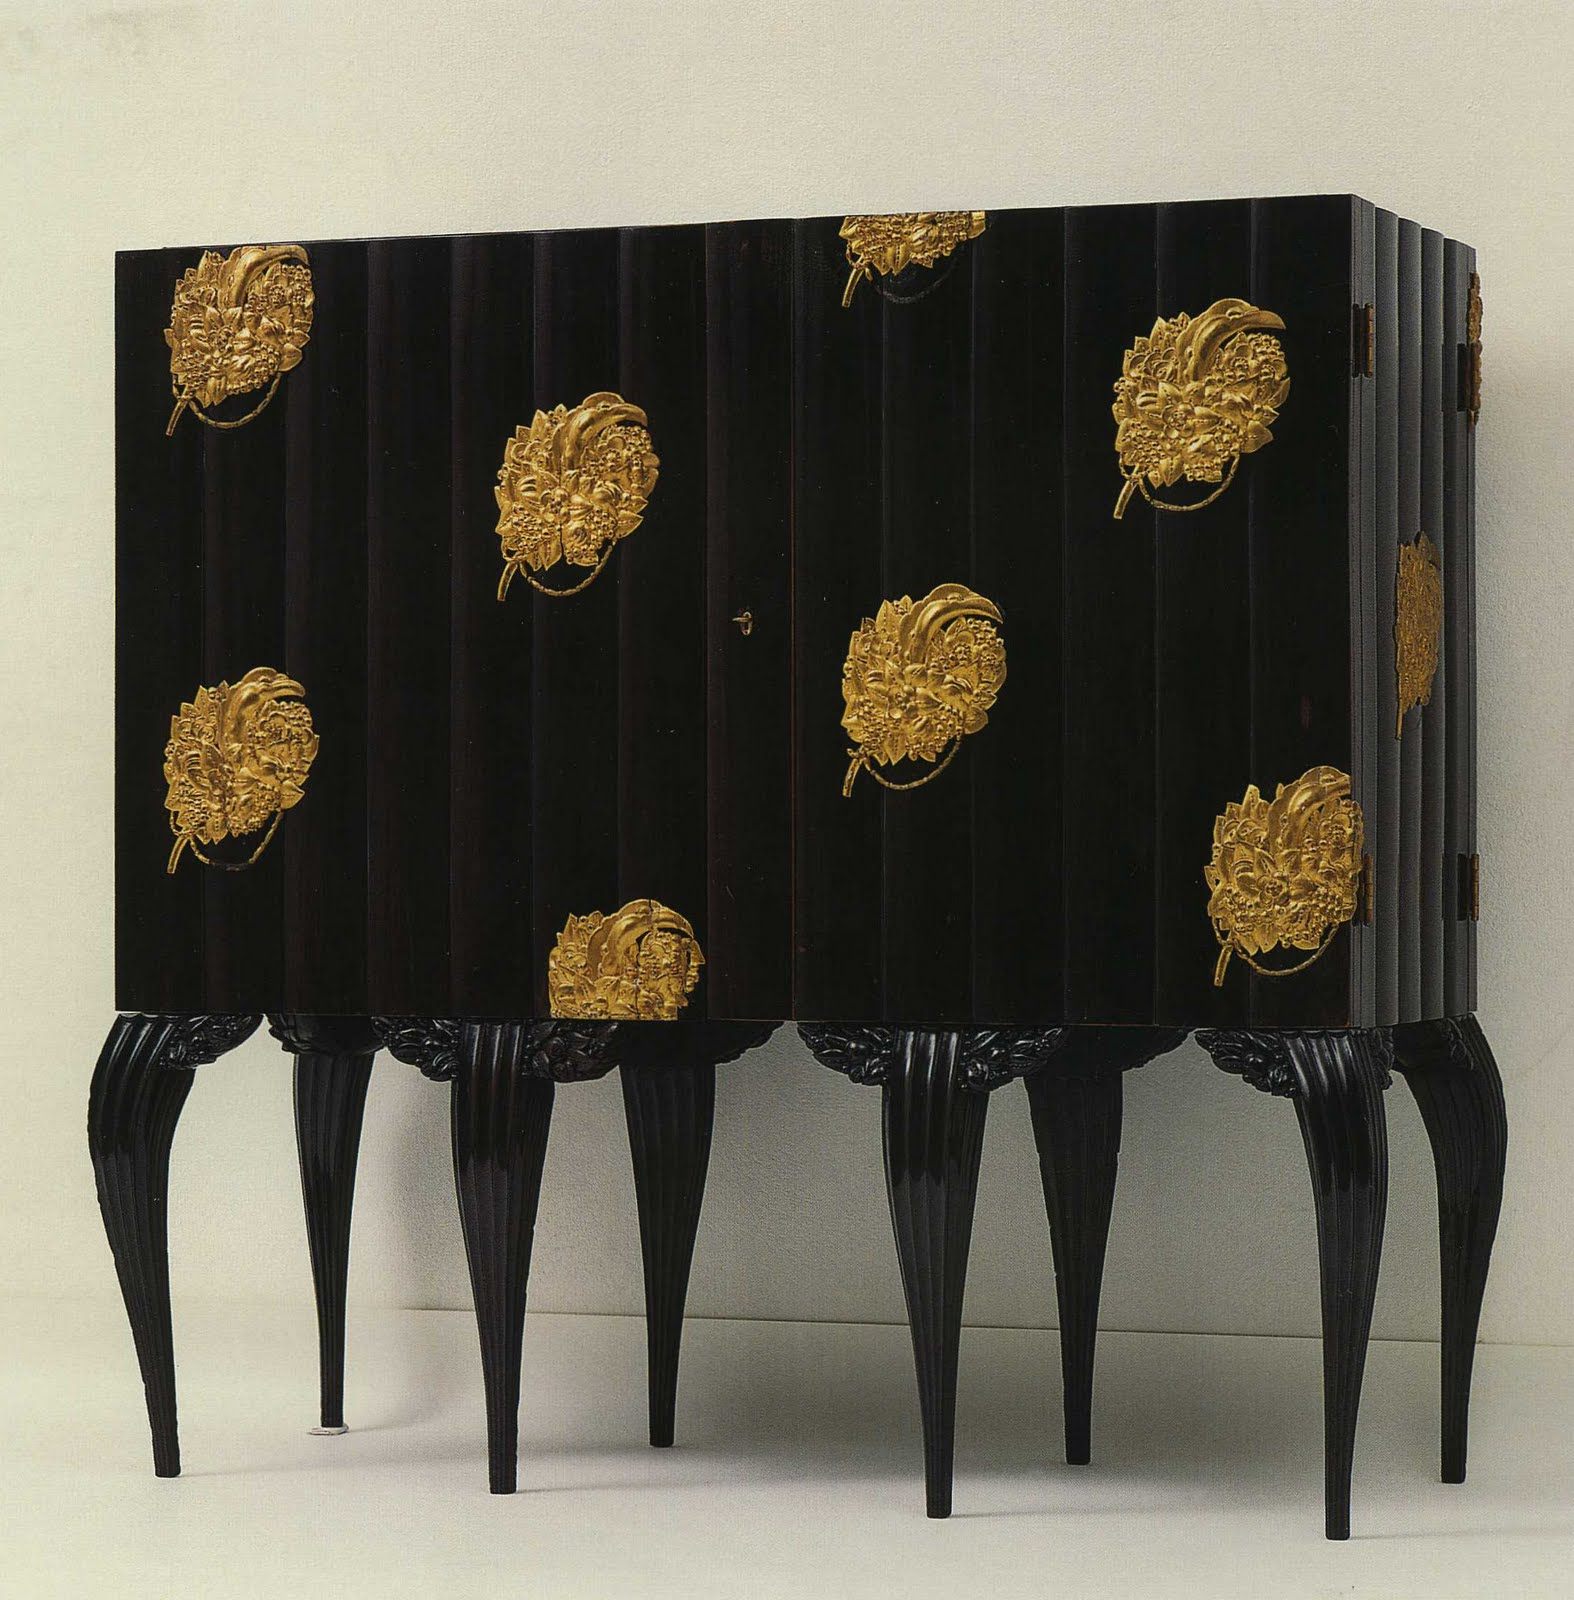 textiles of fin de si cle vienna dagobert peche. Black Bedroom Furniture Sets. Home Design Ideas